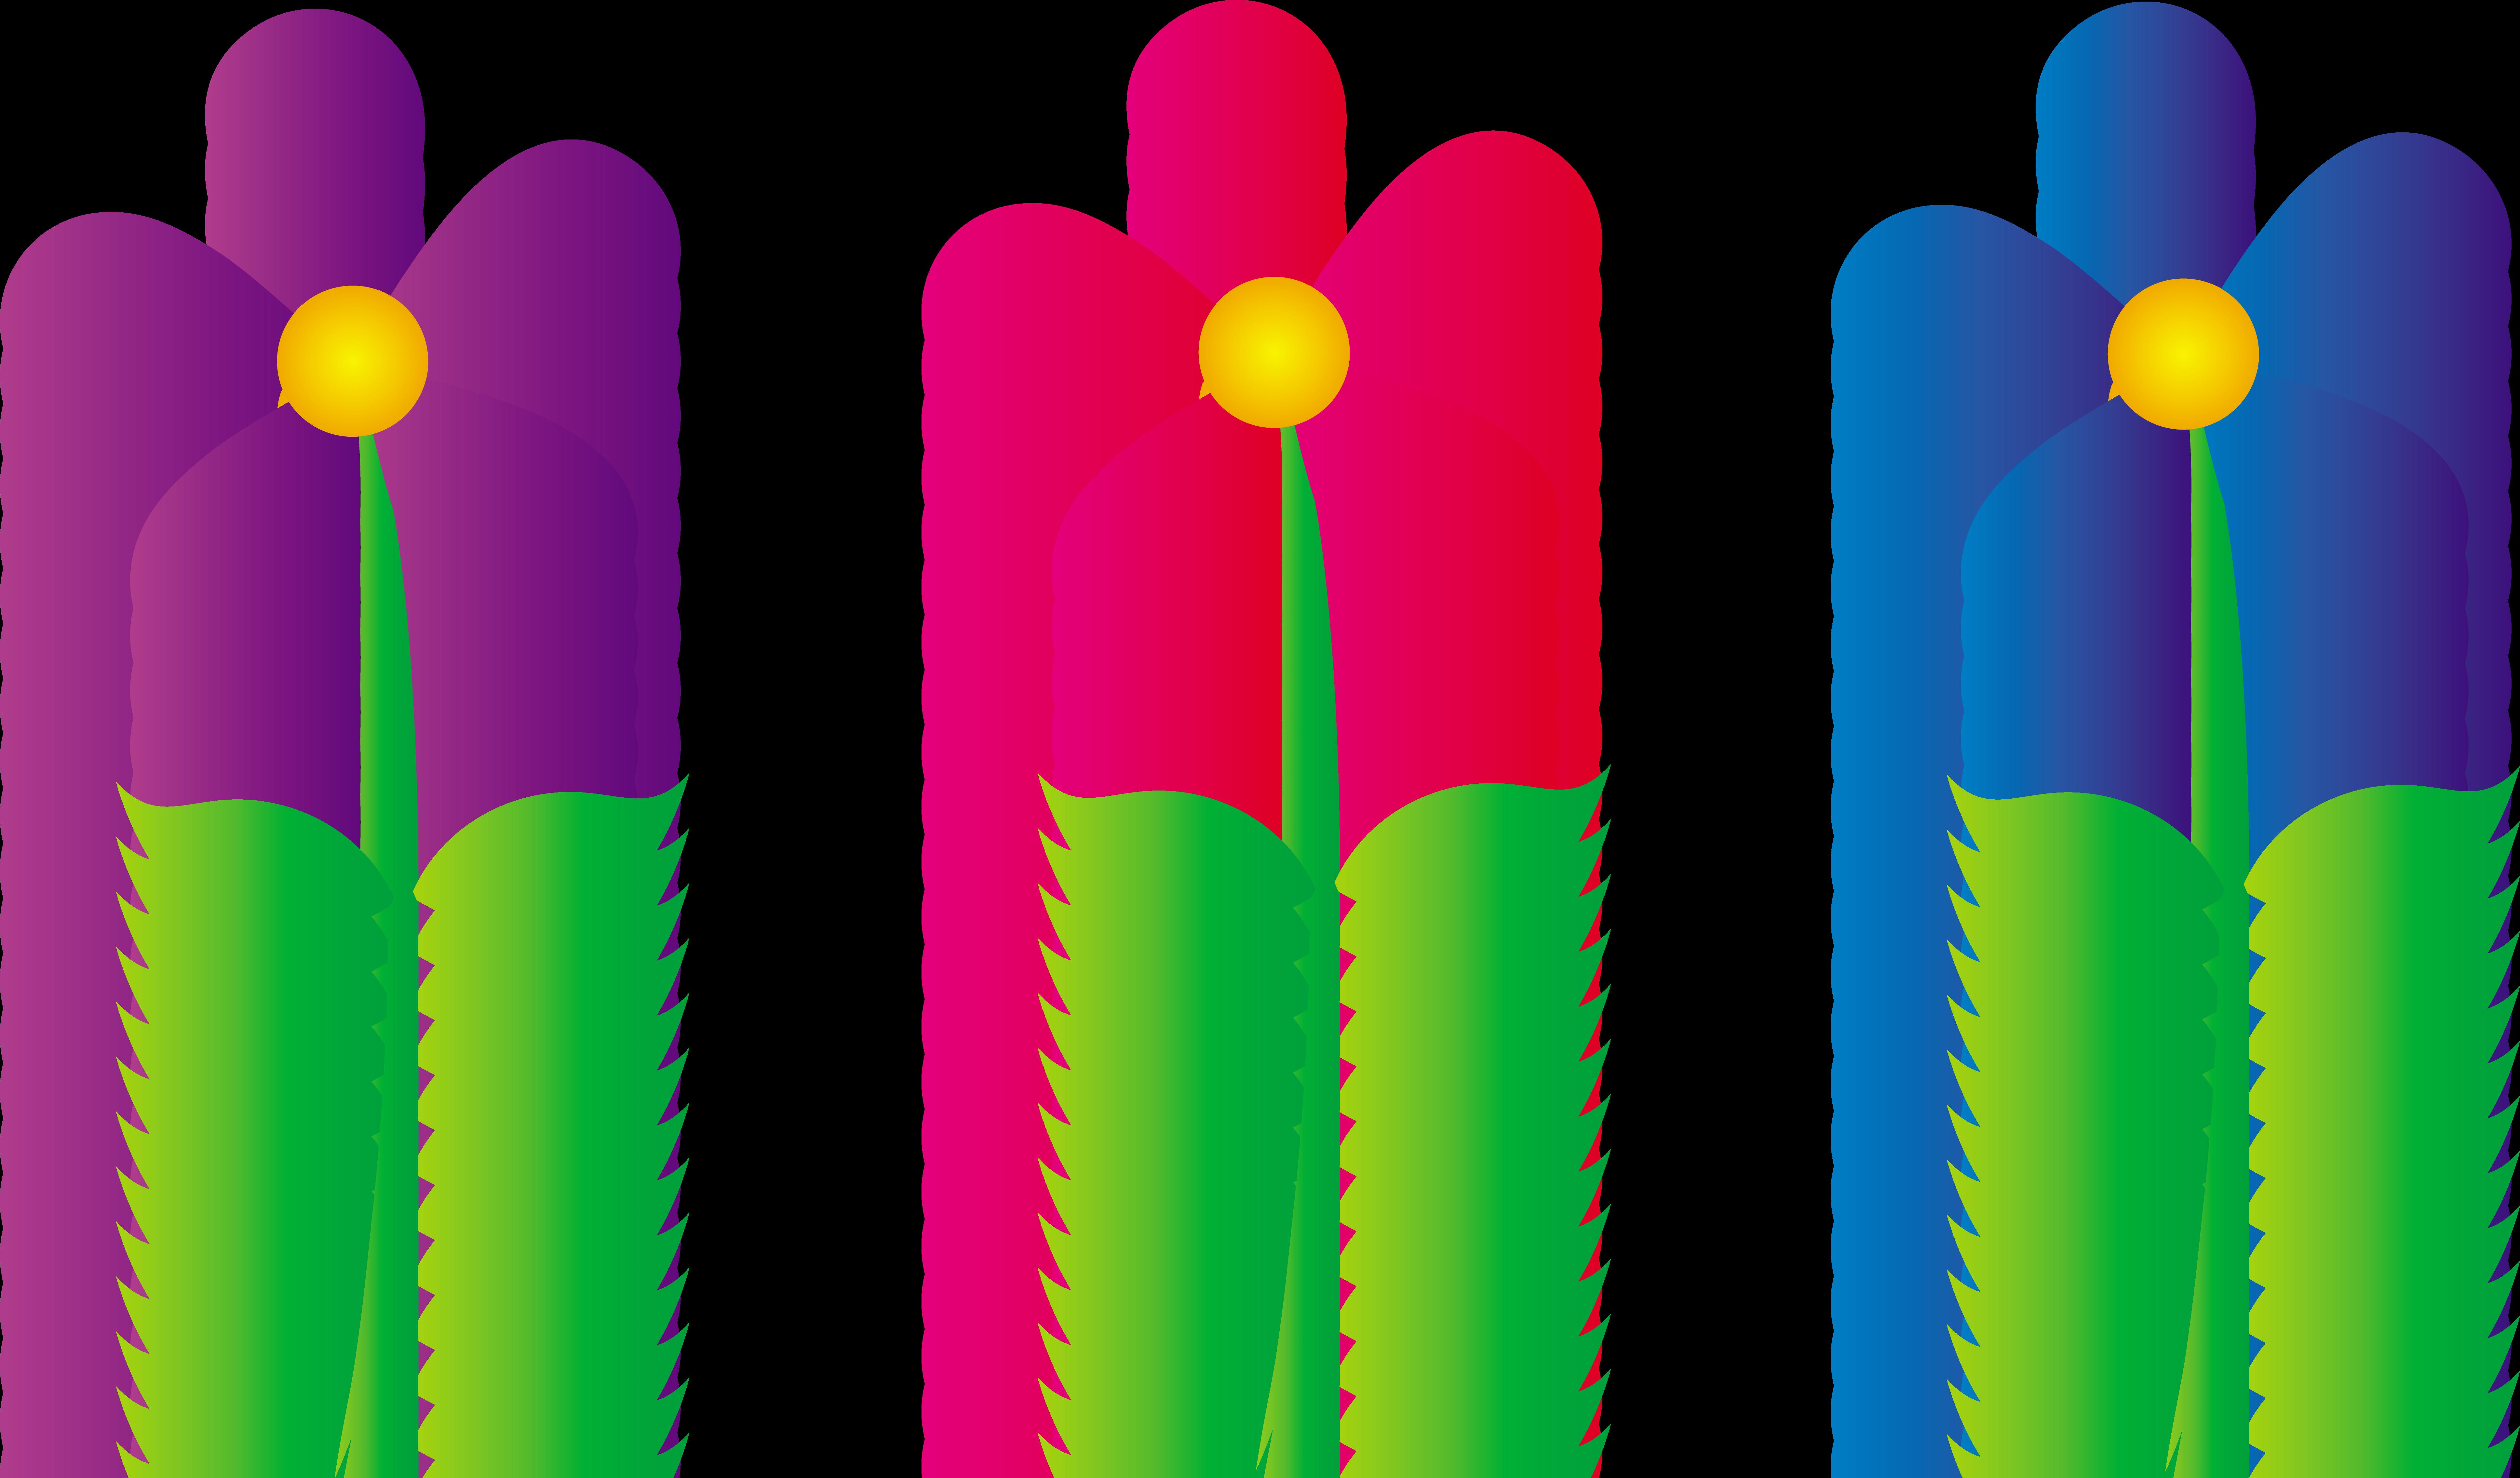 flower border clipart - Flowers Clipart Images